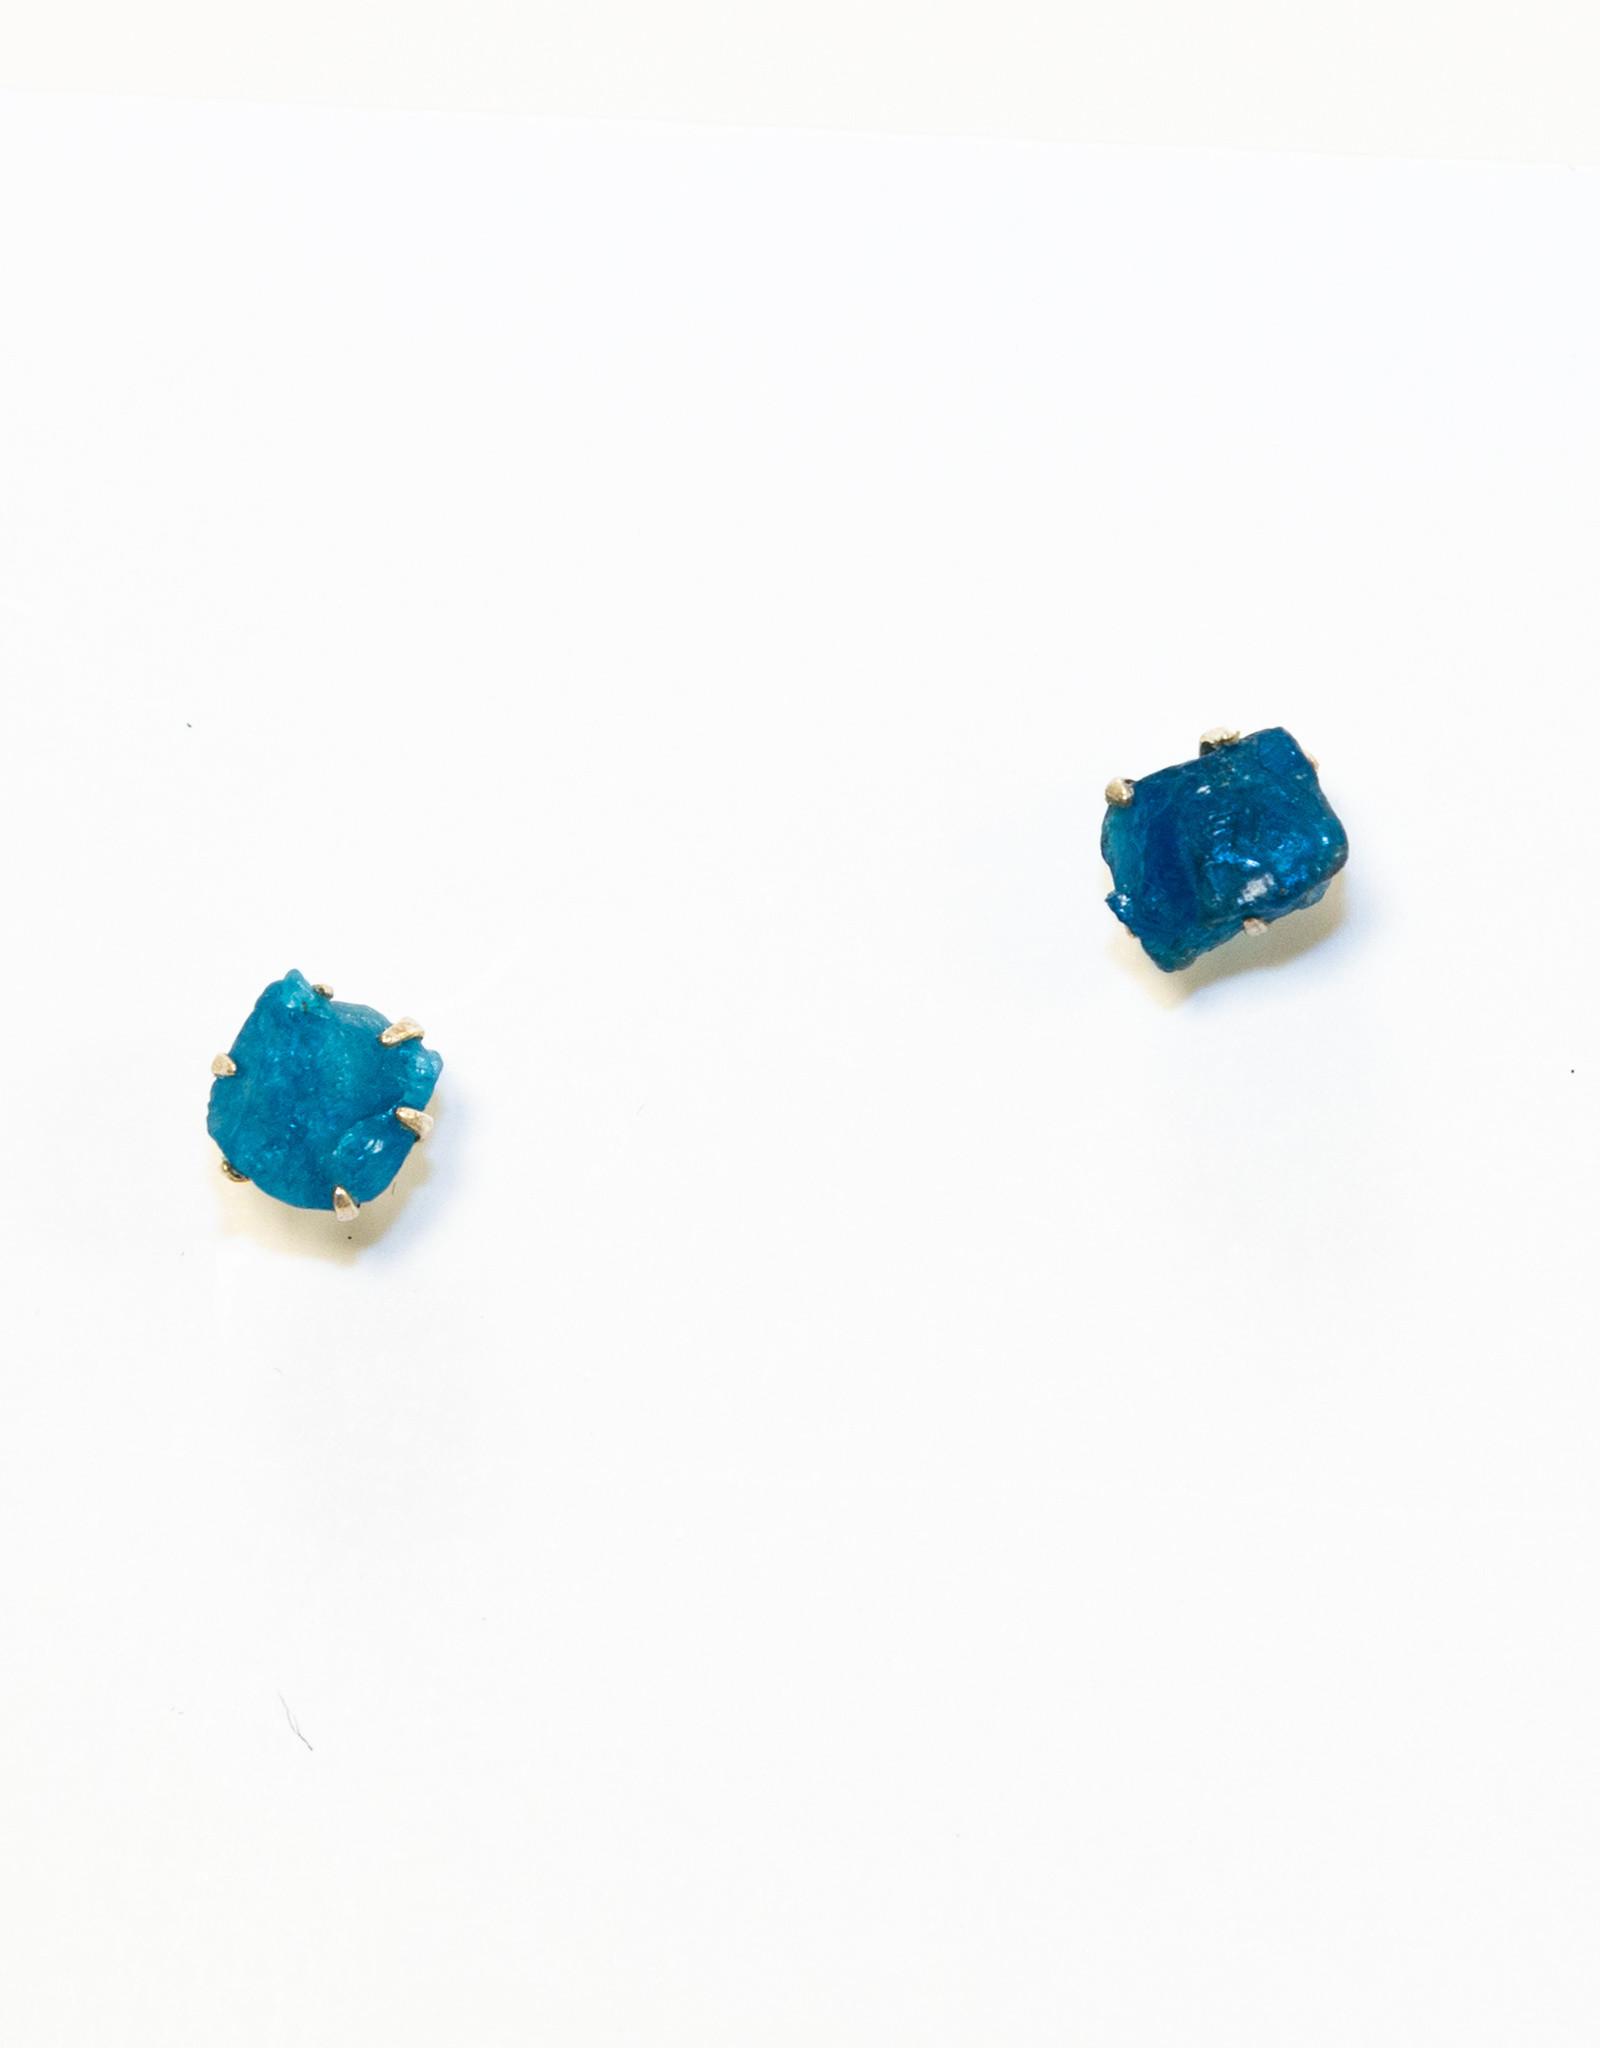 Earrings Evolved Blue Apatite Stone